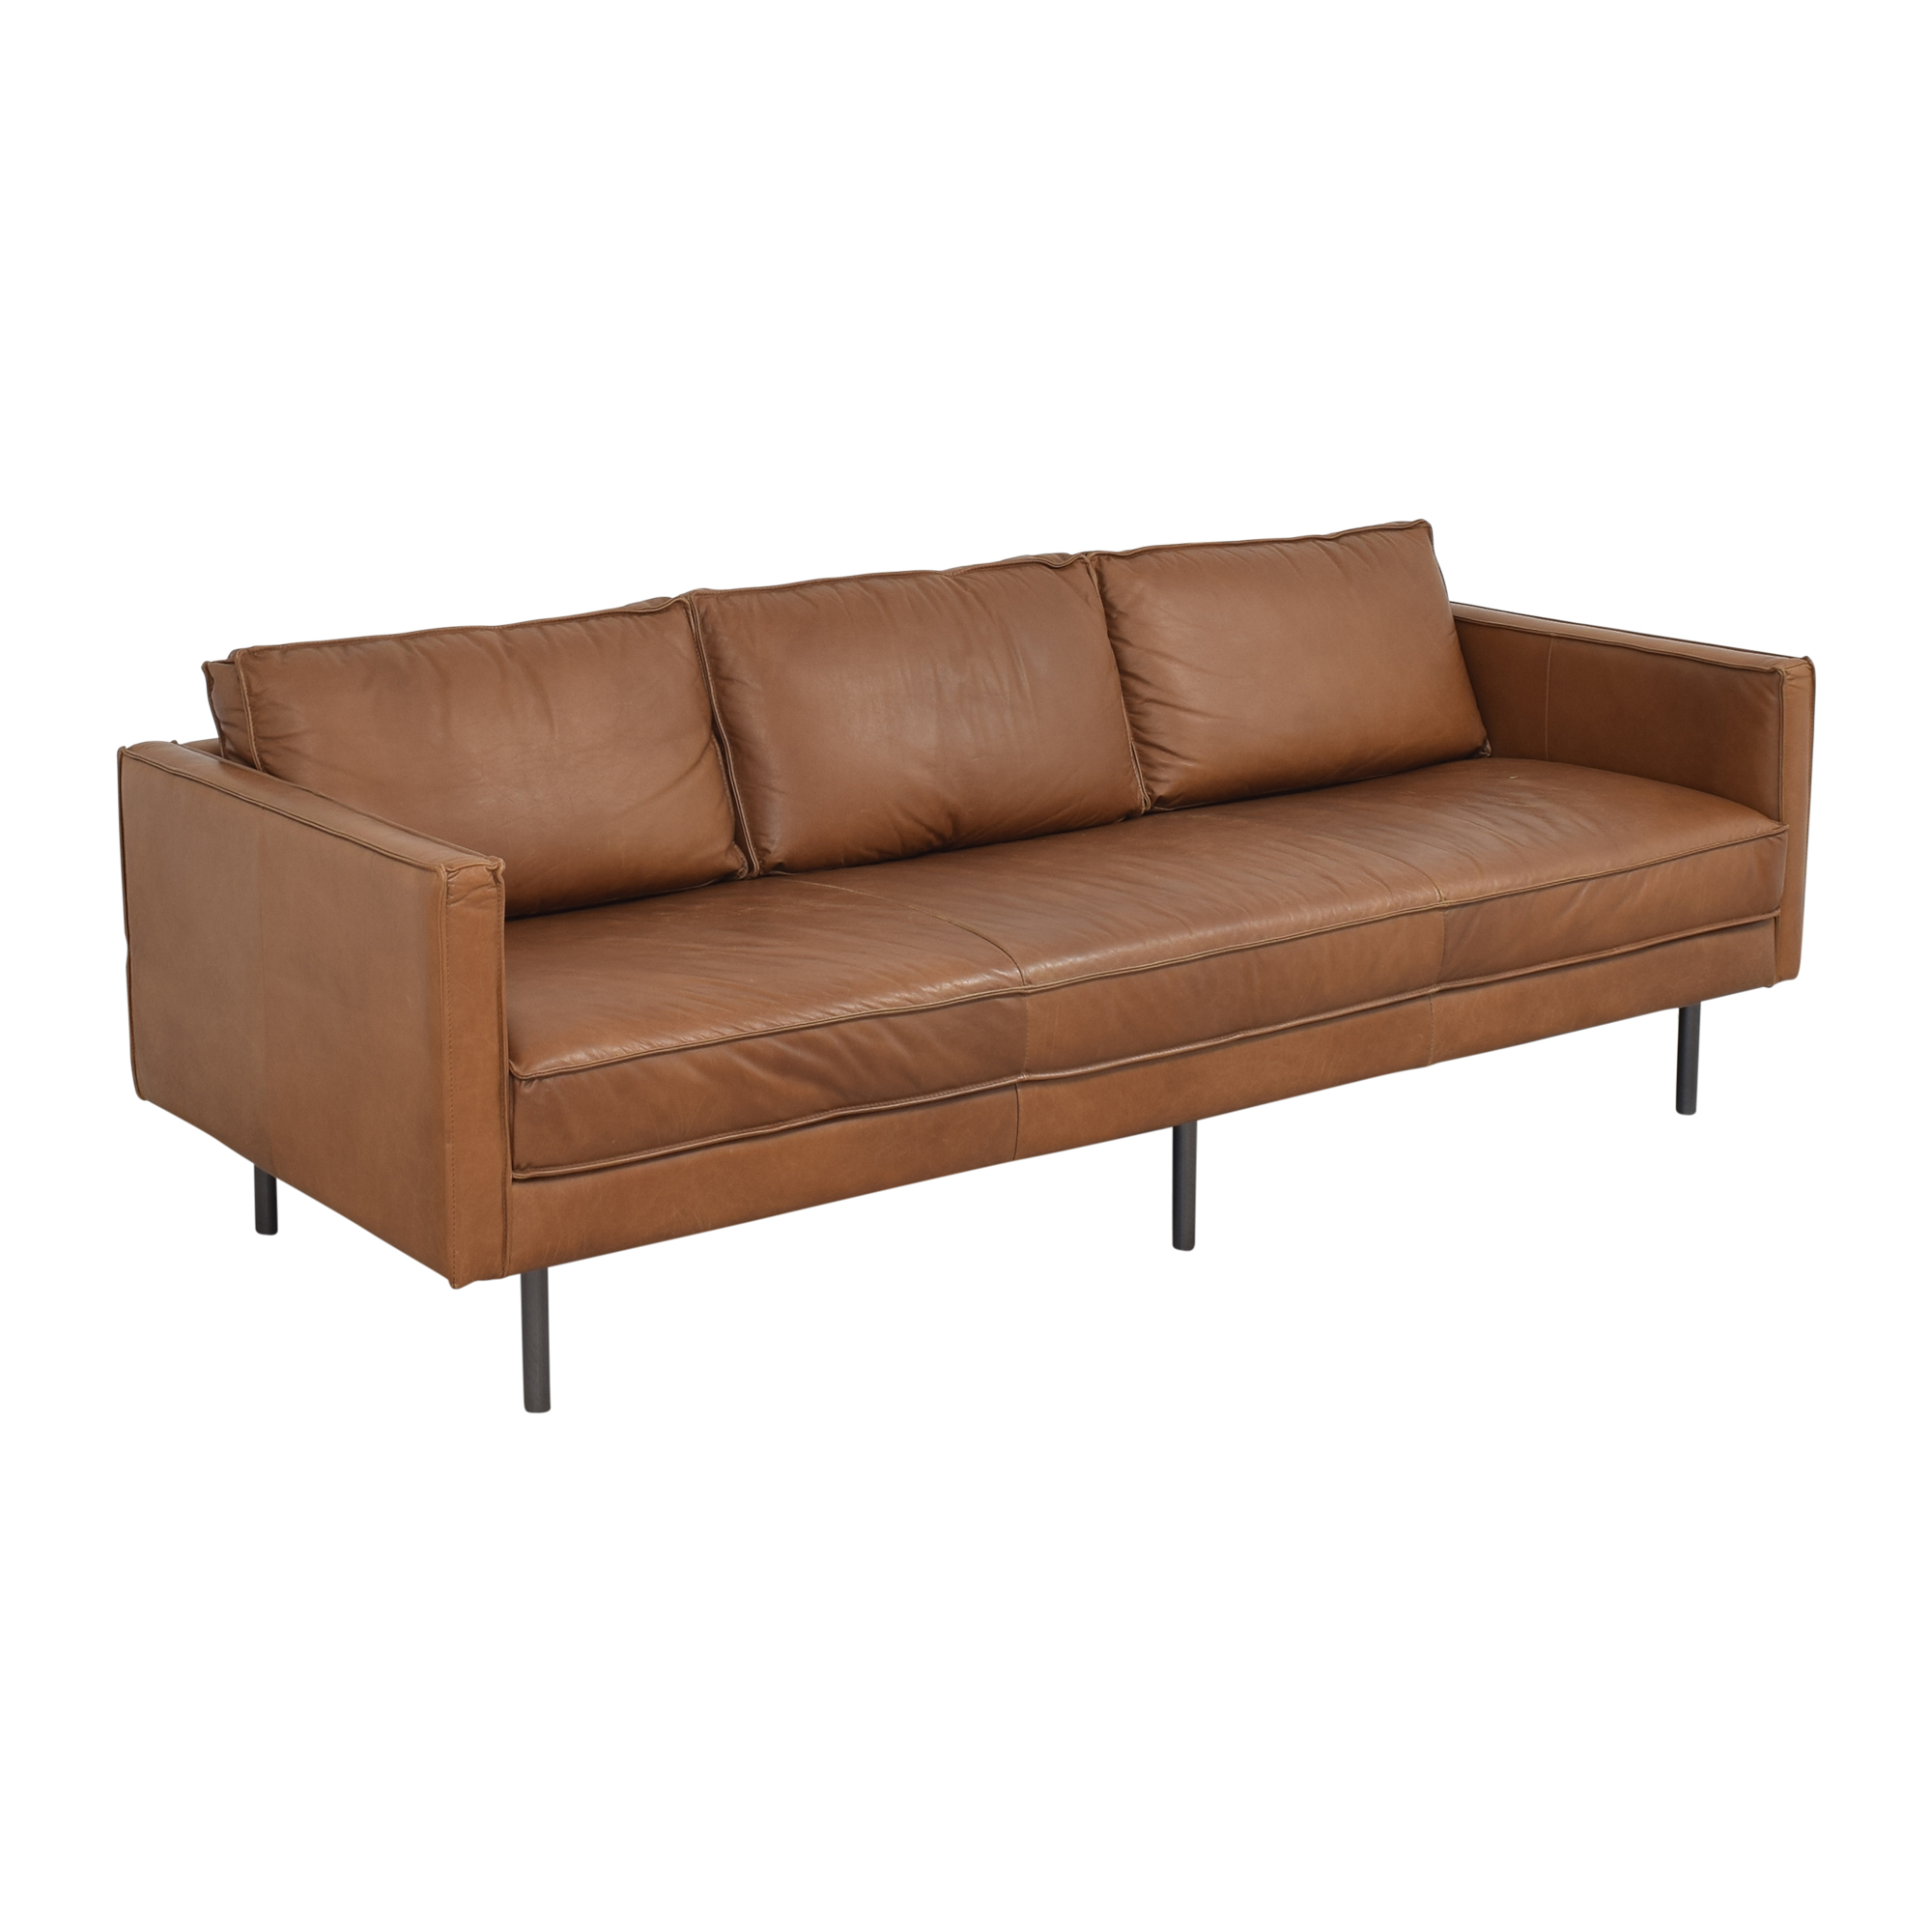 shop West Elm West Elm Axel Bench Cushion Sofa online